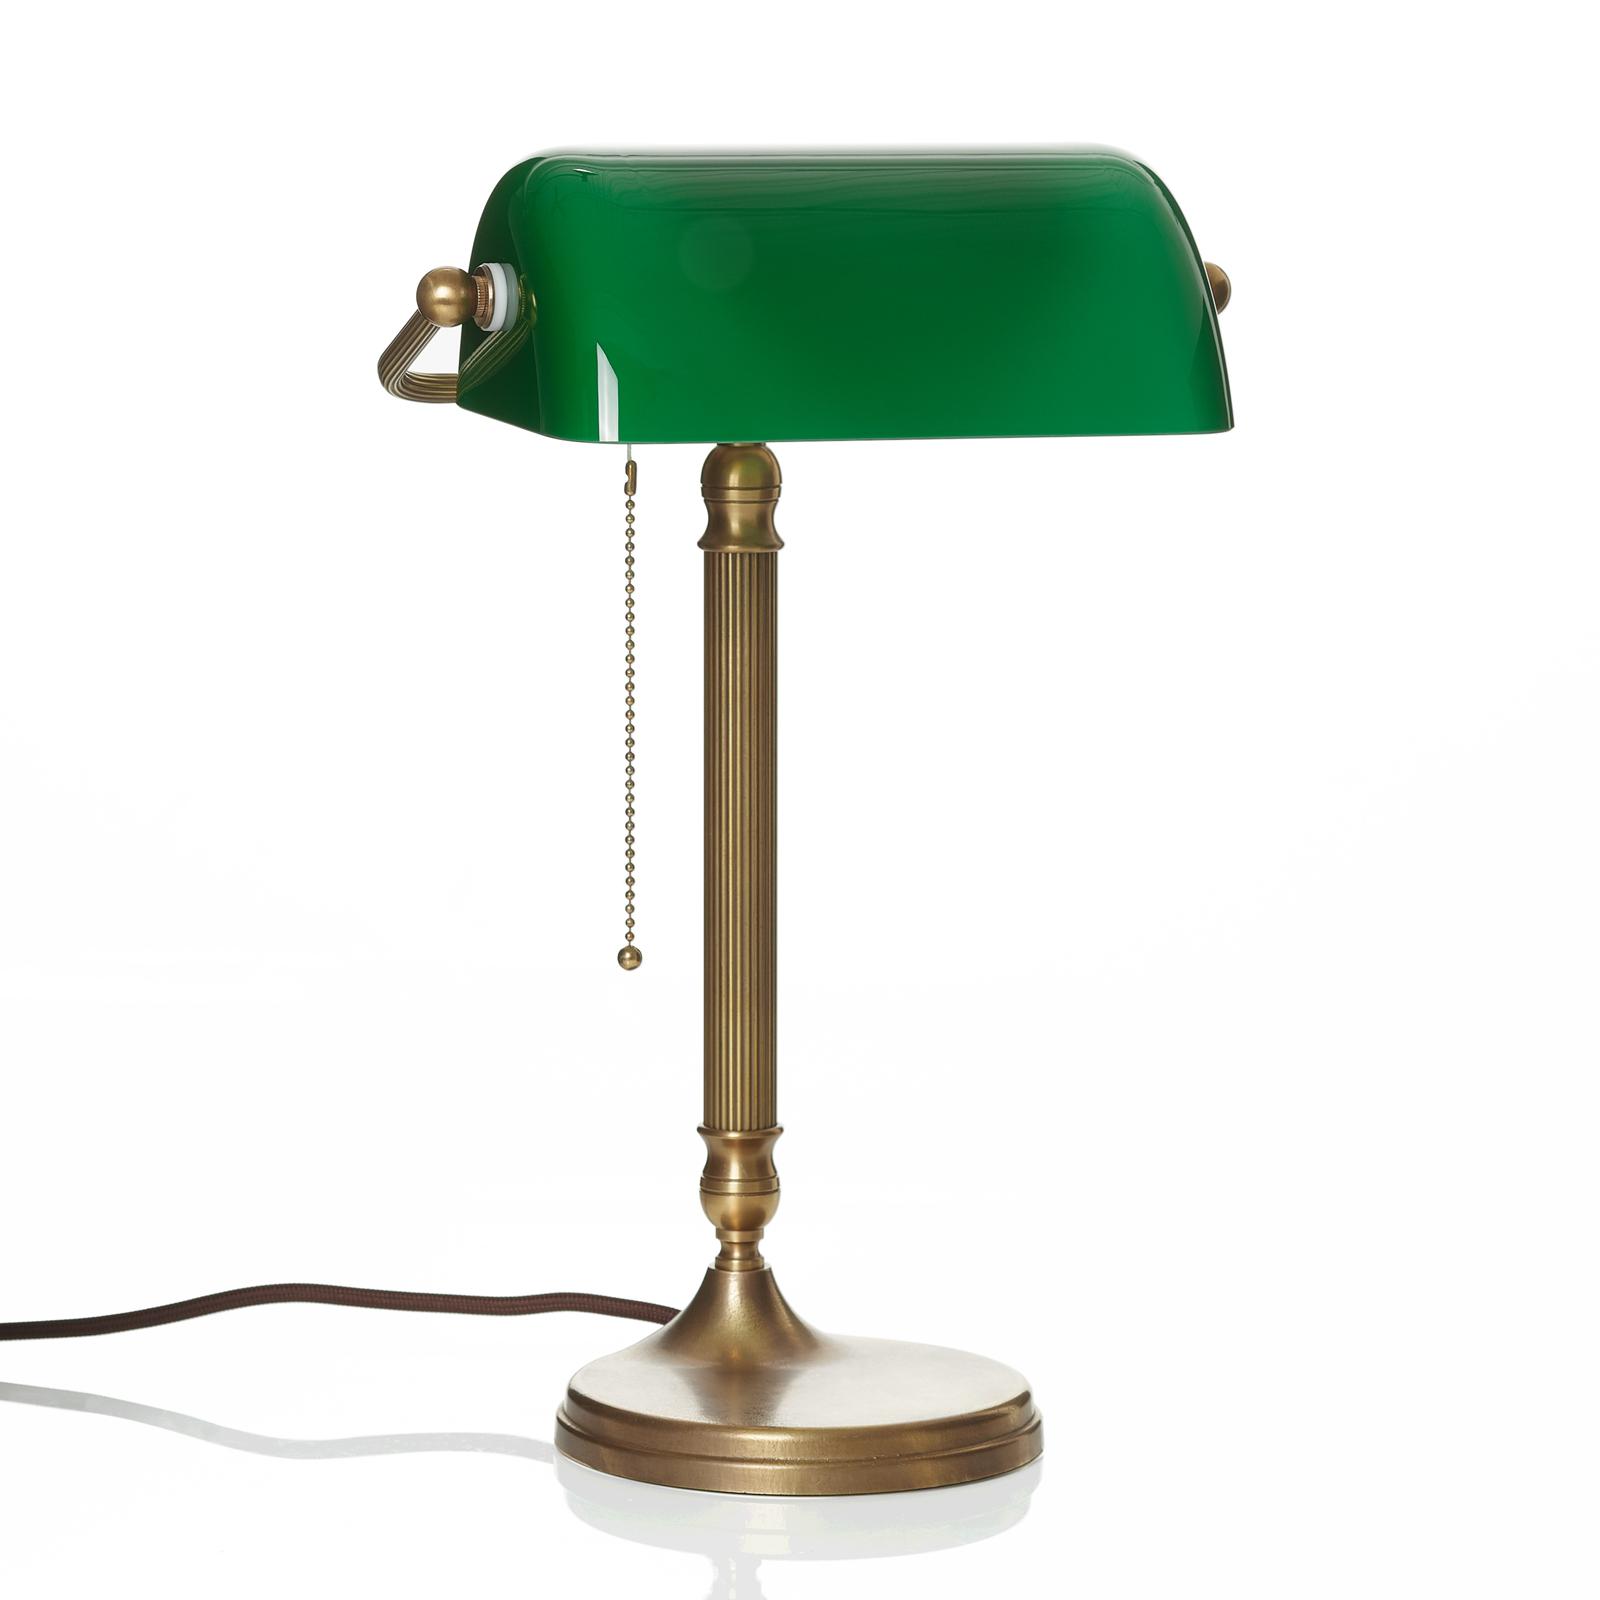 JIVAN handmade banker's lamp_1542002_1